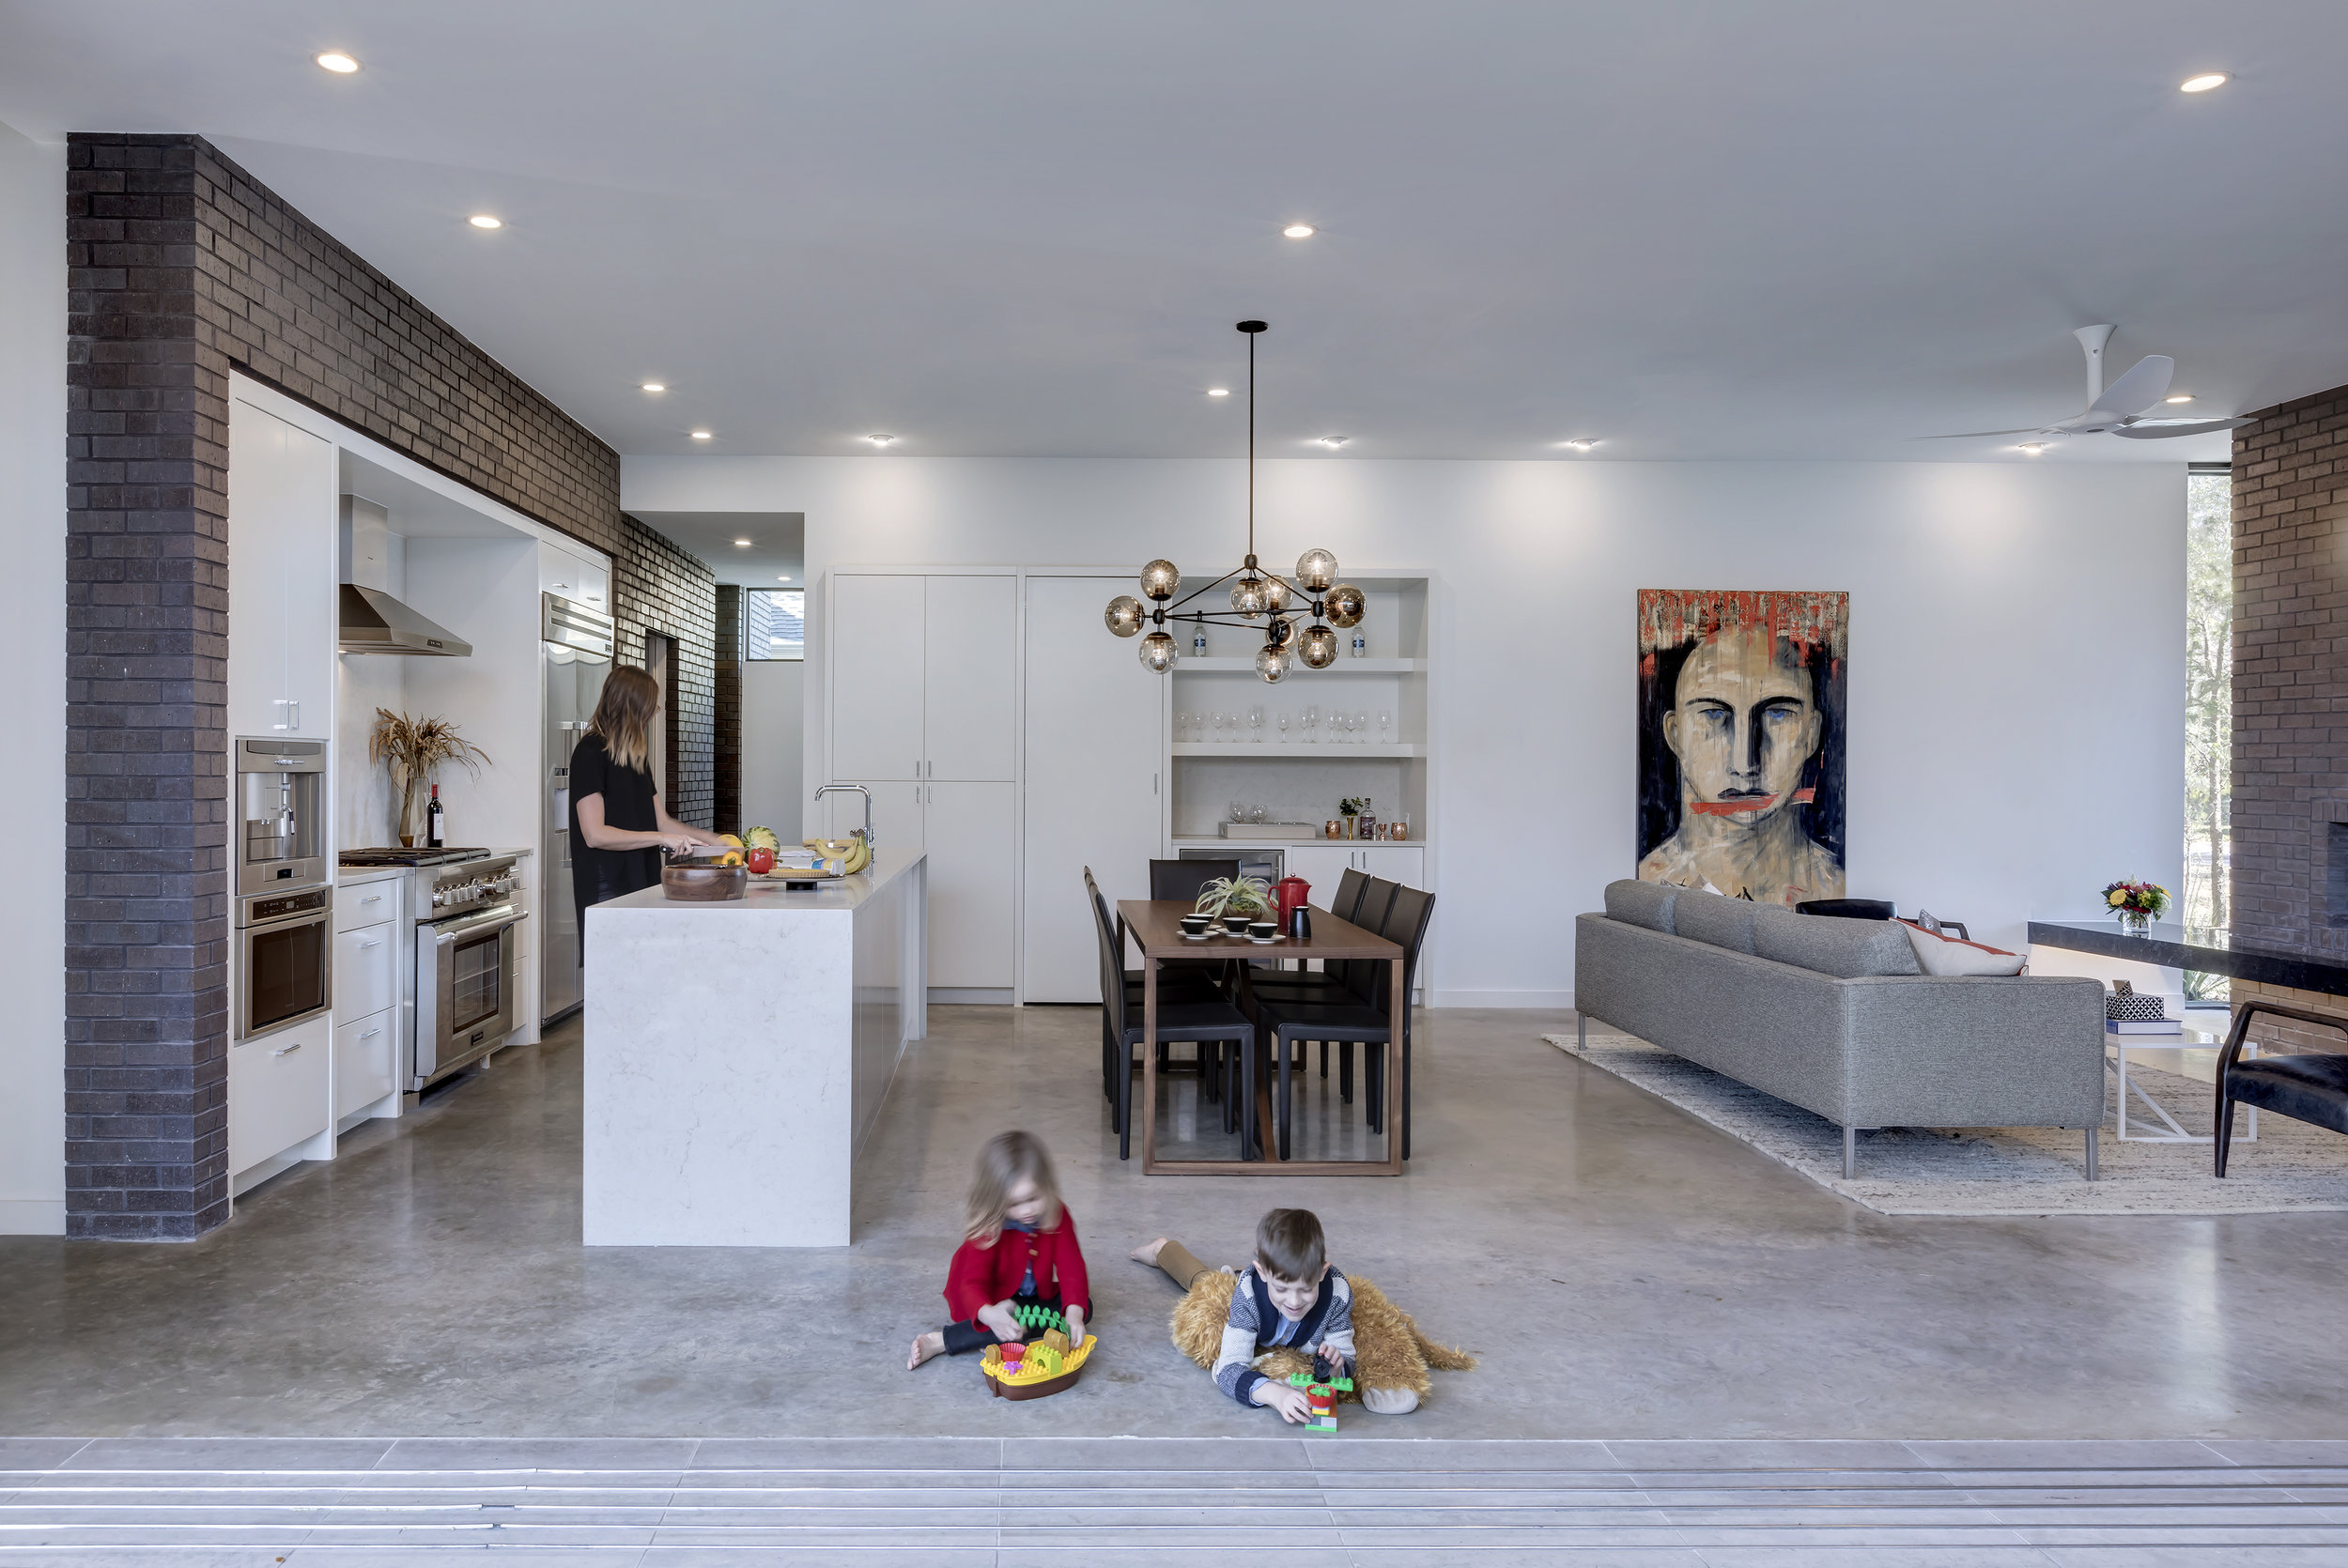 01 Living-Dining-Kitchen_Main Stay House by Matt Fajkus Architecture_Photo 1 by Charles Davis Smith.jpg